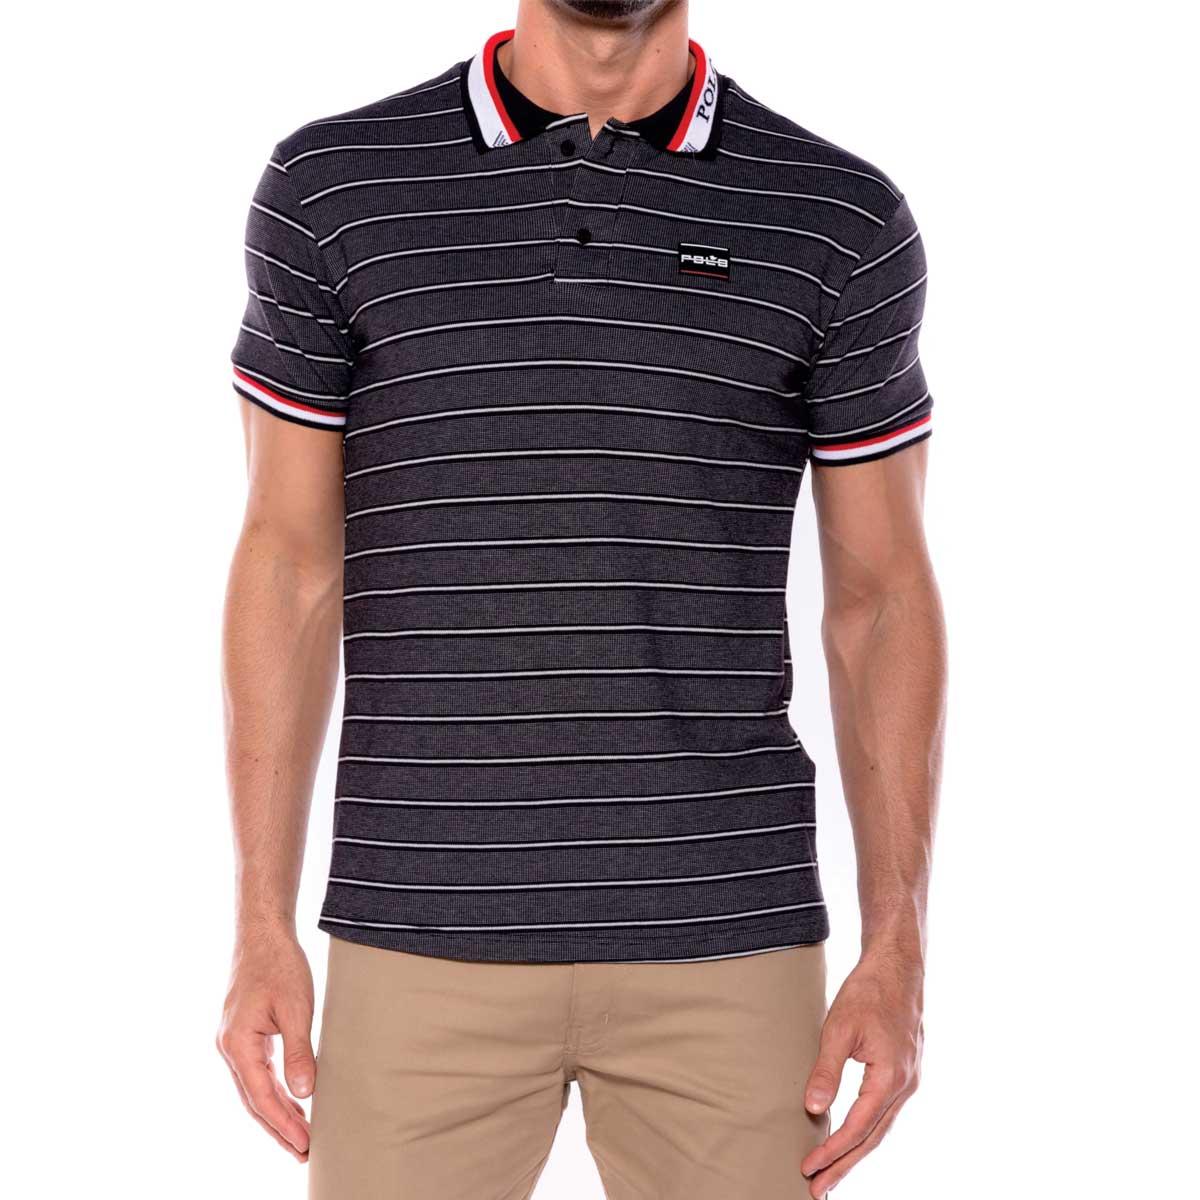 Camisa Masculina Polo RG518